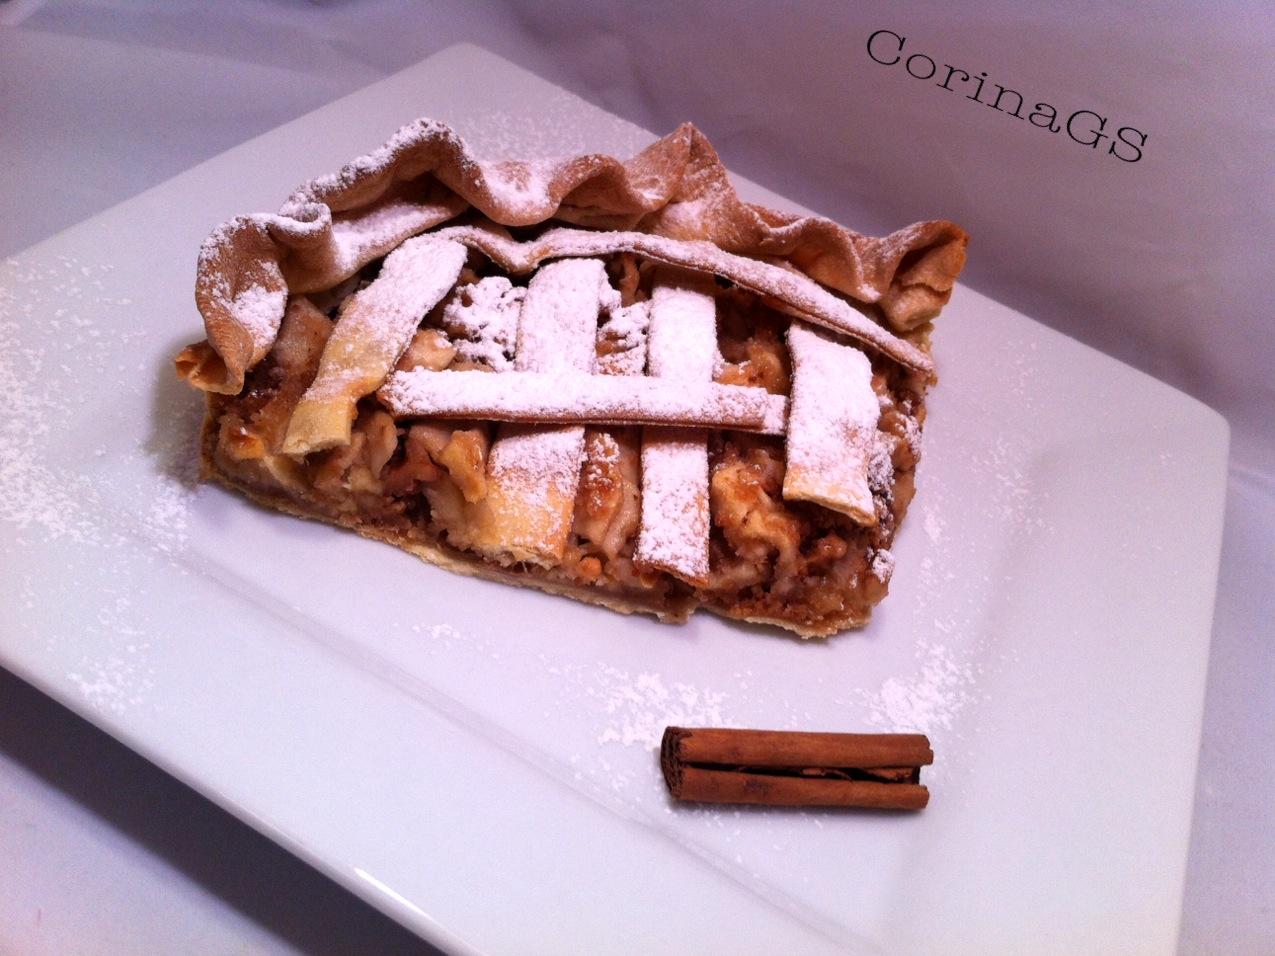 Torta di mele-Ricetta dolce-CorinaGS